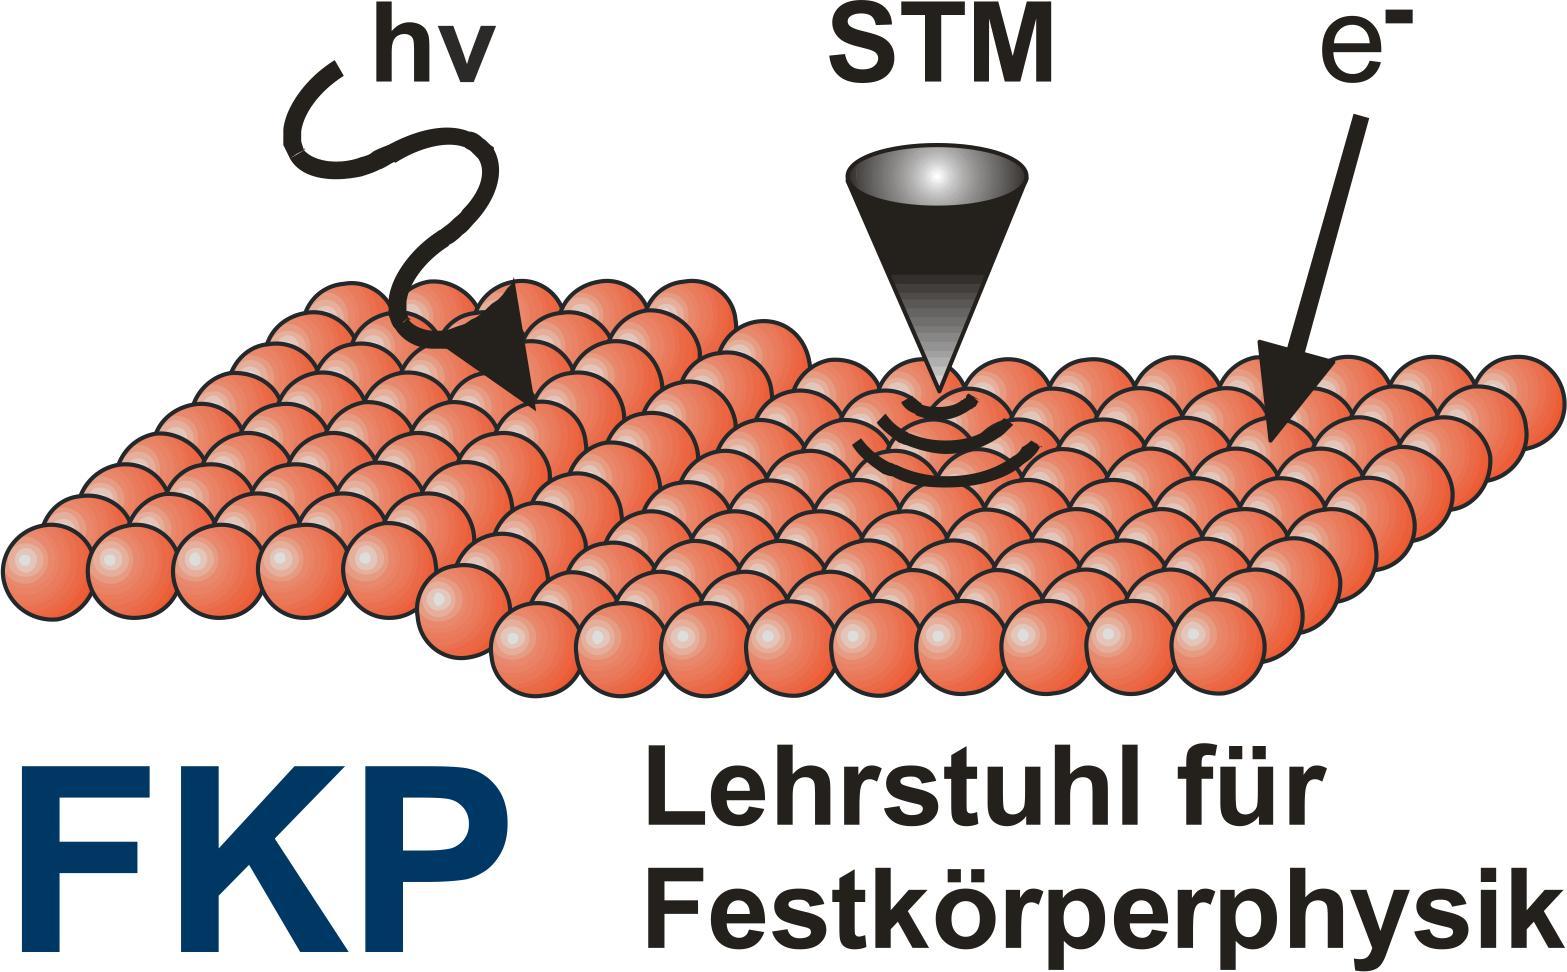 Lehrstuhl für Festkörperphysik (FKP)